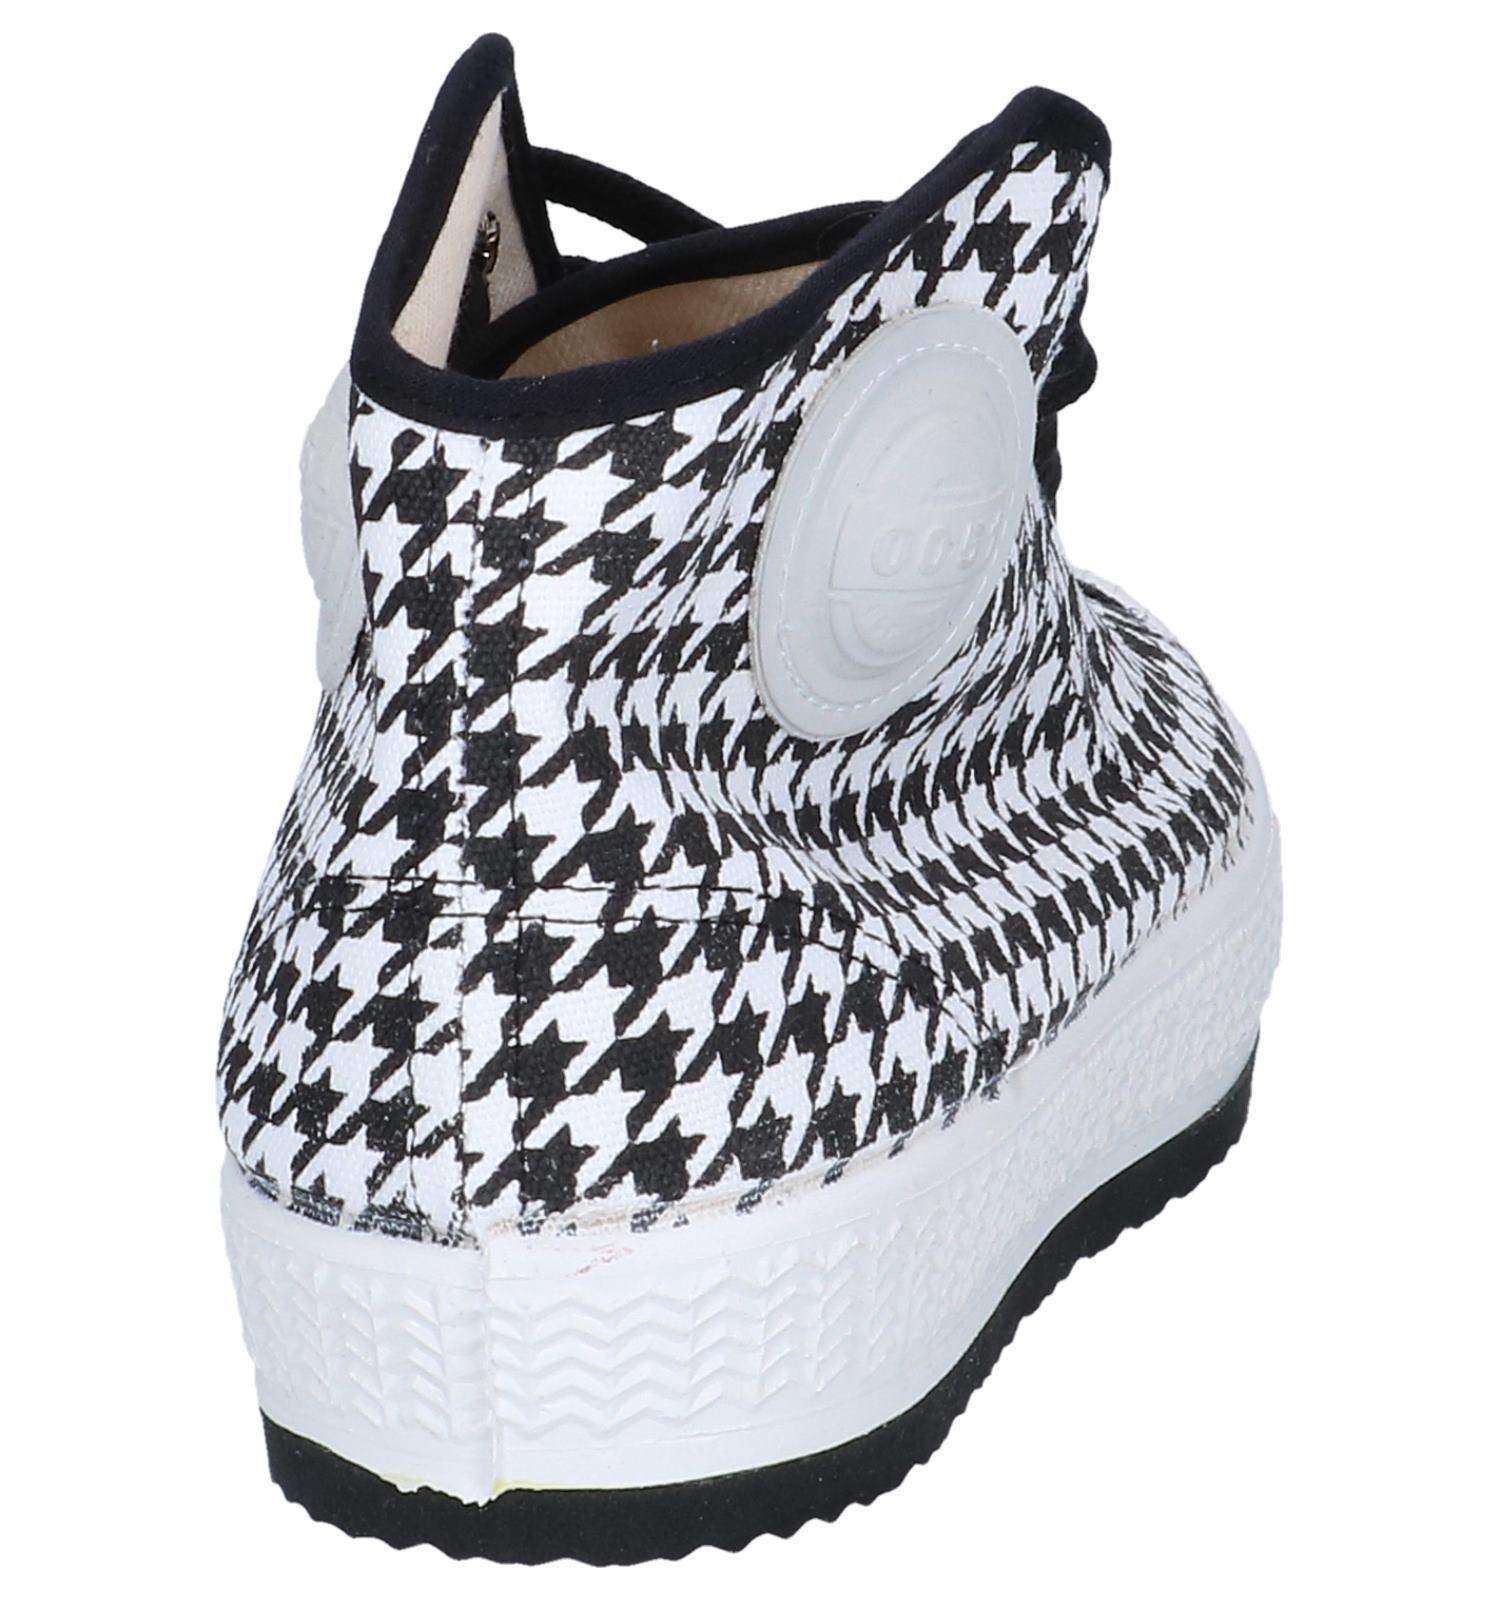 Sneaker Hoge 0051 Hoge Sneaker Tatra Tatra Zwarte Hoge Sneaker Zwarte 0051 Zwarte 0051 Yfy6Igb7vm